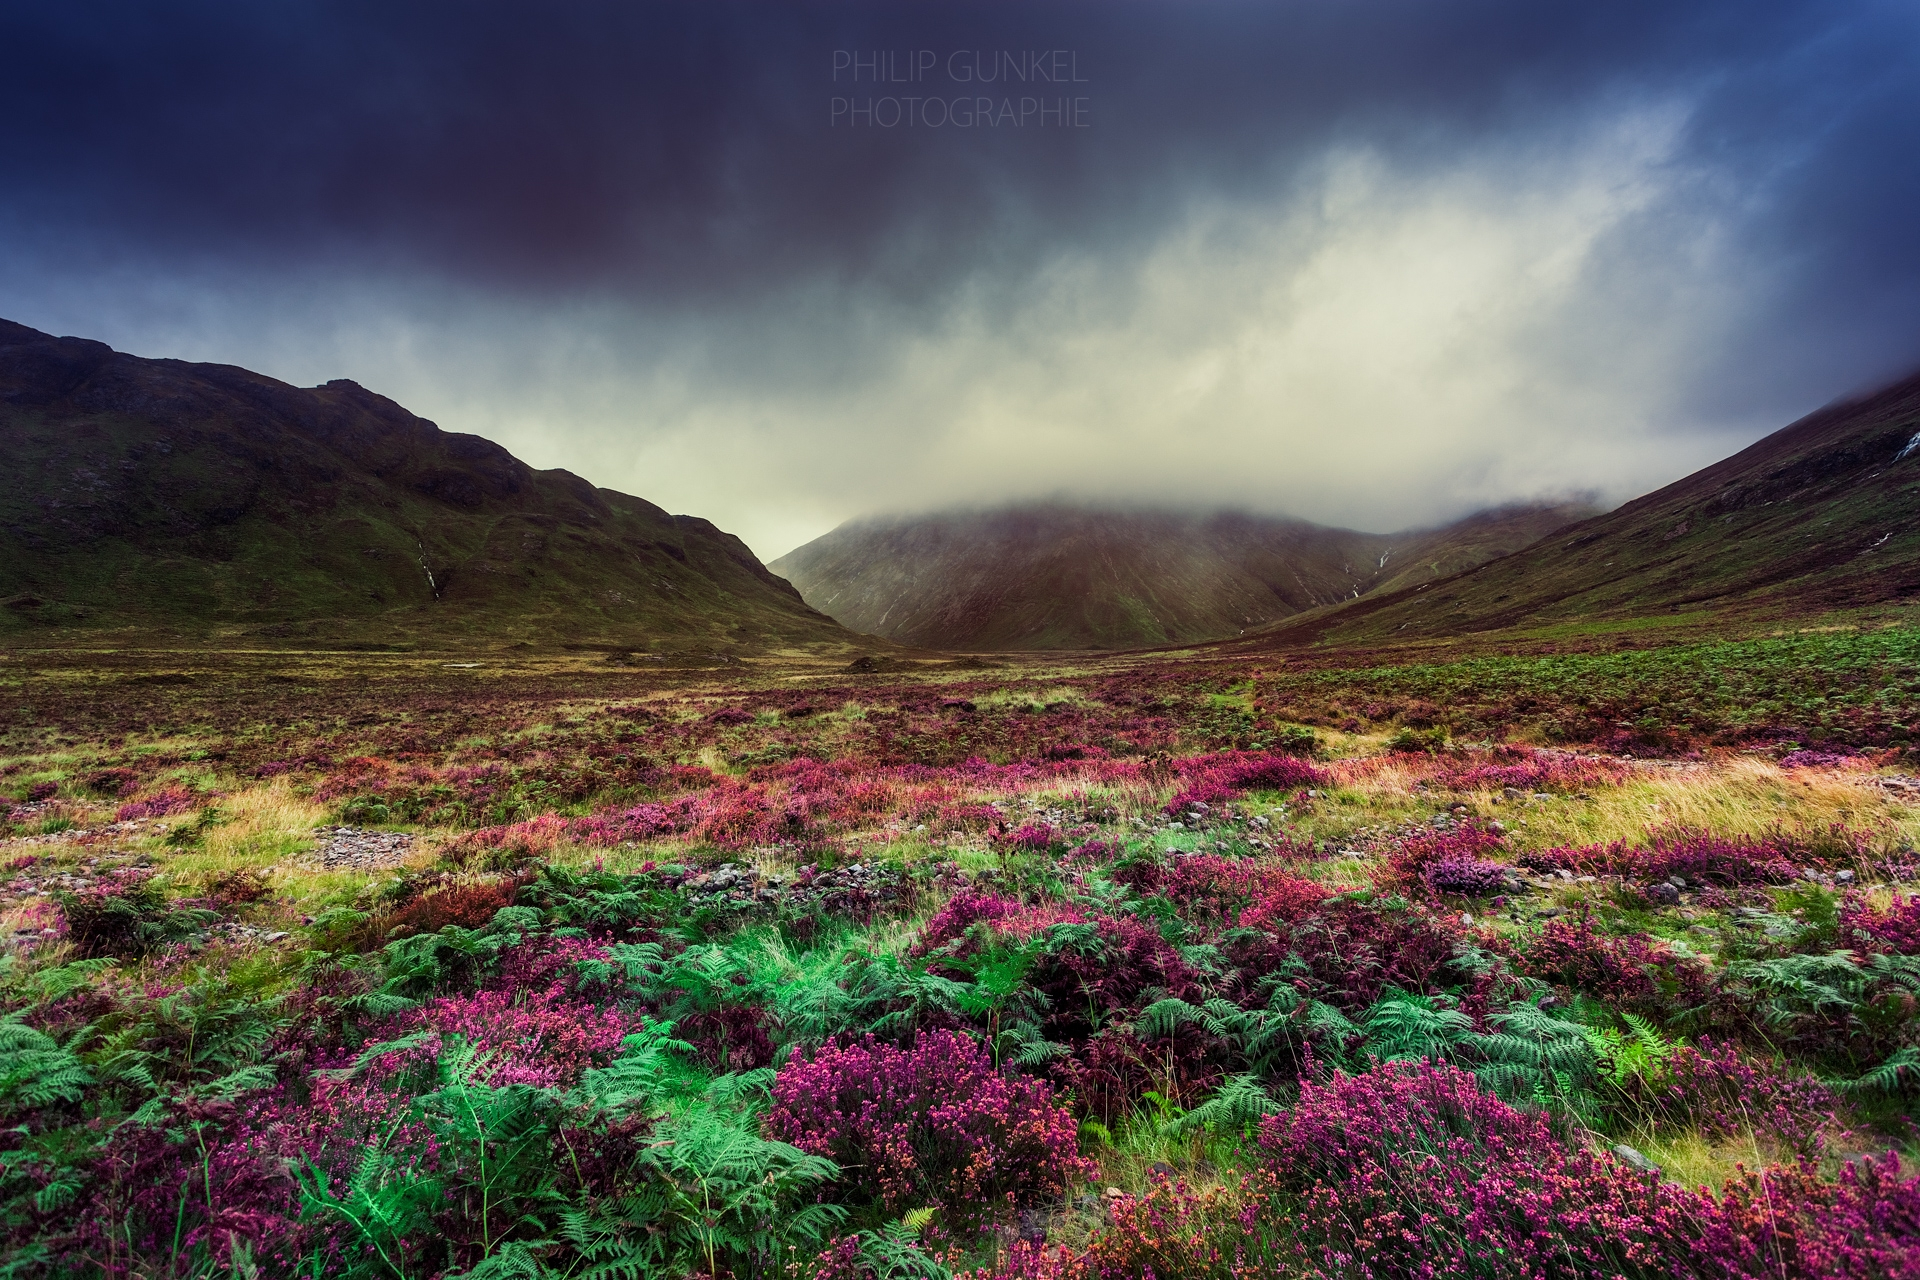 highland fairy tale - phigun | ello